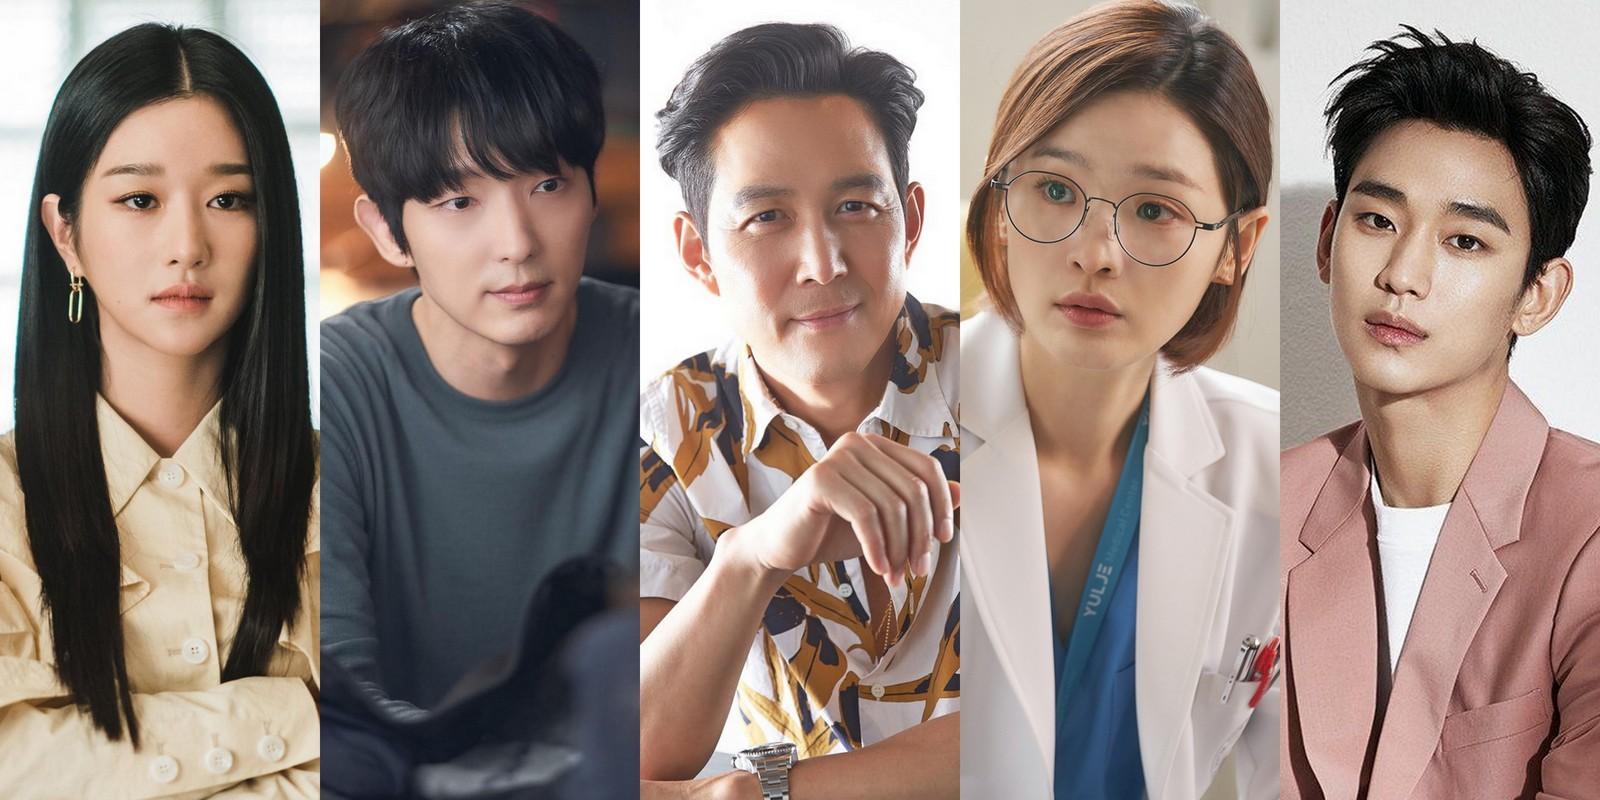 lee-joon-gi-kim-soo-hyun-seo-ye-ji-and-more-to-attend-2020-asia-artist-awards-2-3